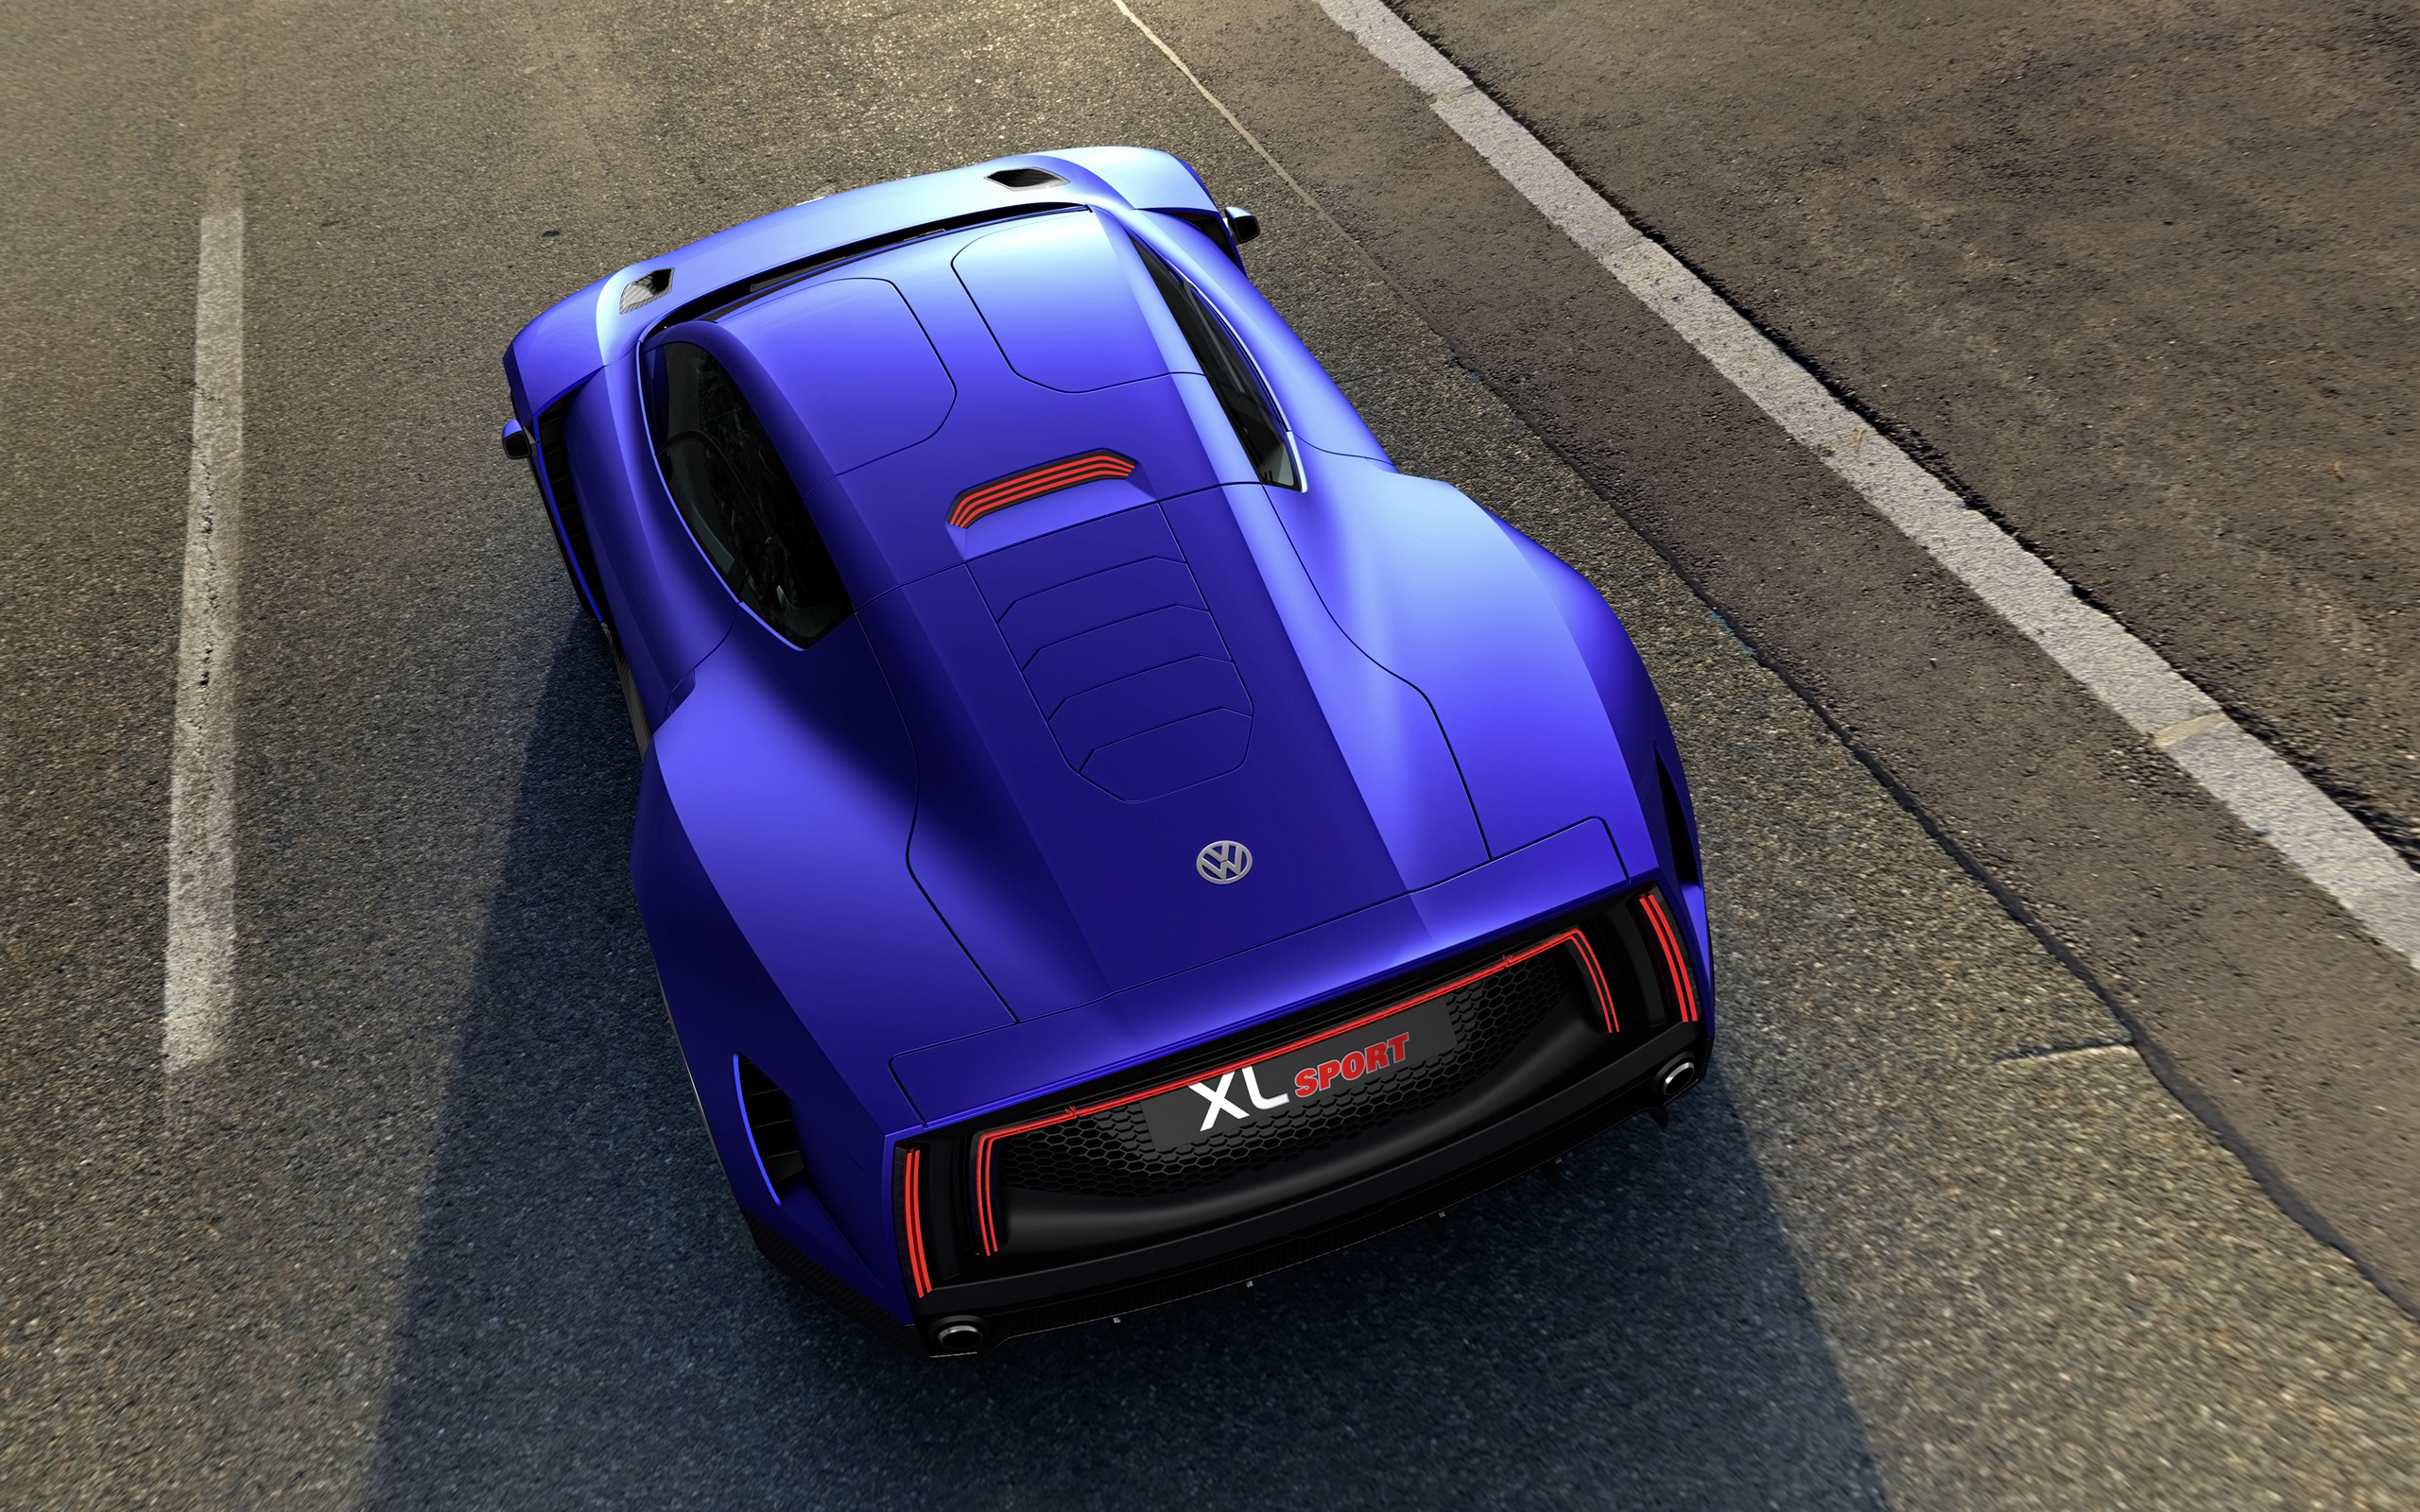 Volkswagen XL Sport Concept Wallpaper HD Car Wallpapers